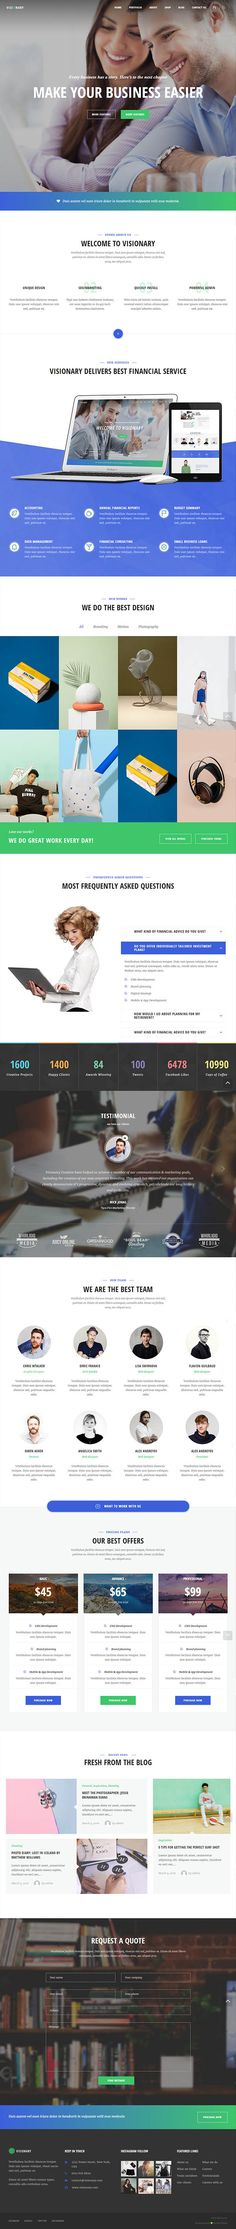 Visionary : Creative Agency Multipurpose WordPress Theme   Wordpress Themes   Design Blog